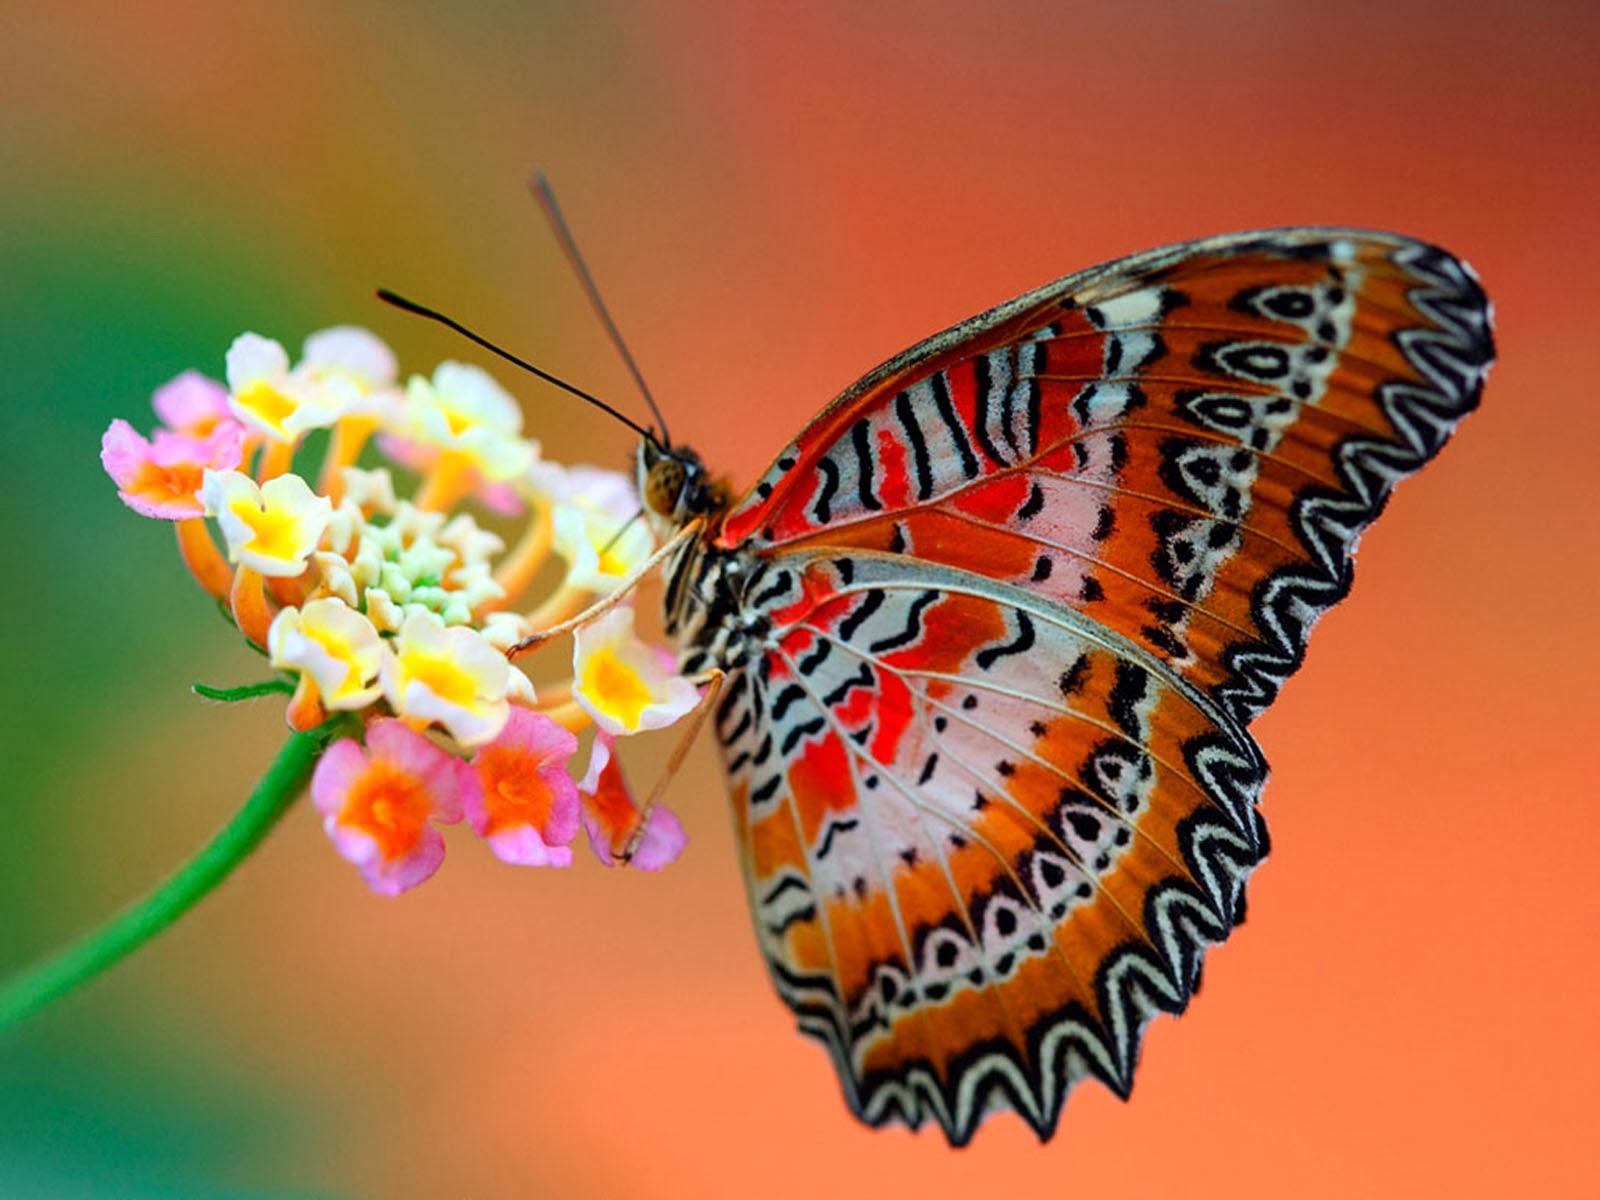 Butterfly Desktop Wallpaper - WallpaperSafari